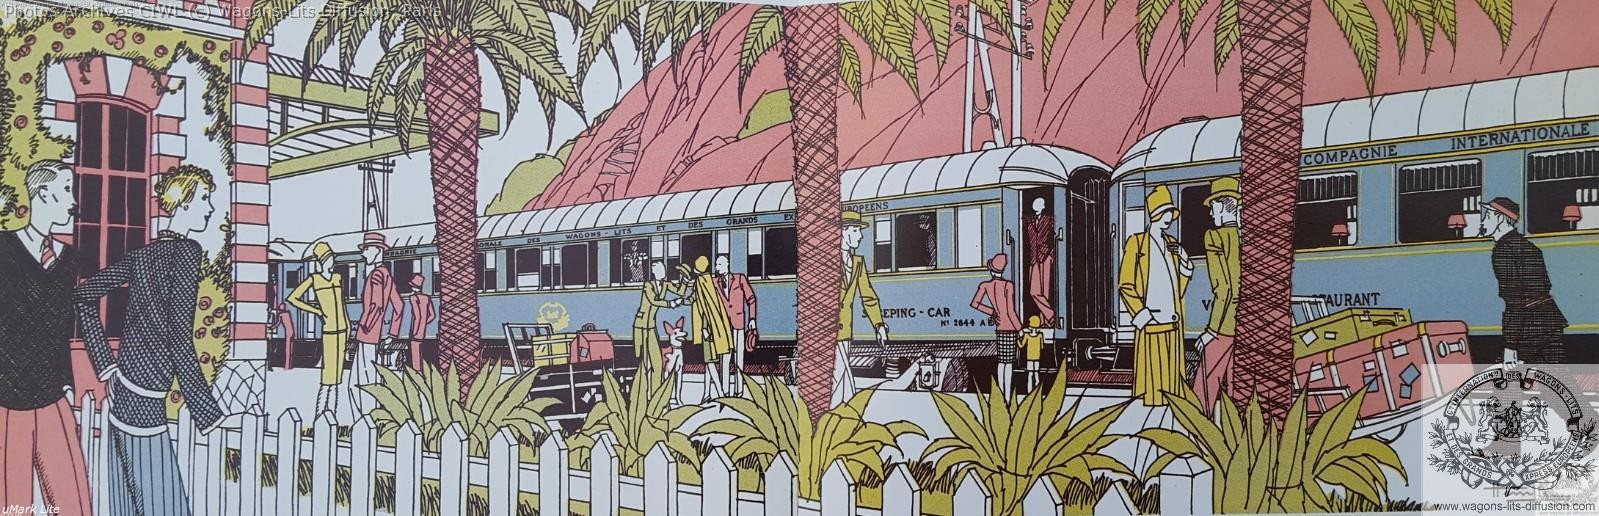 Wl train bleu depliant pub ciwl 1925